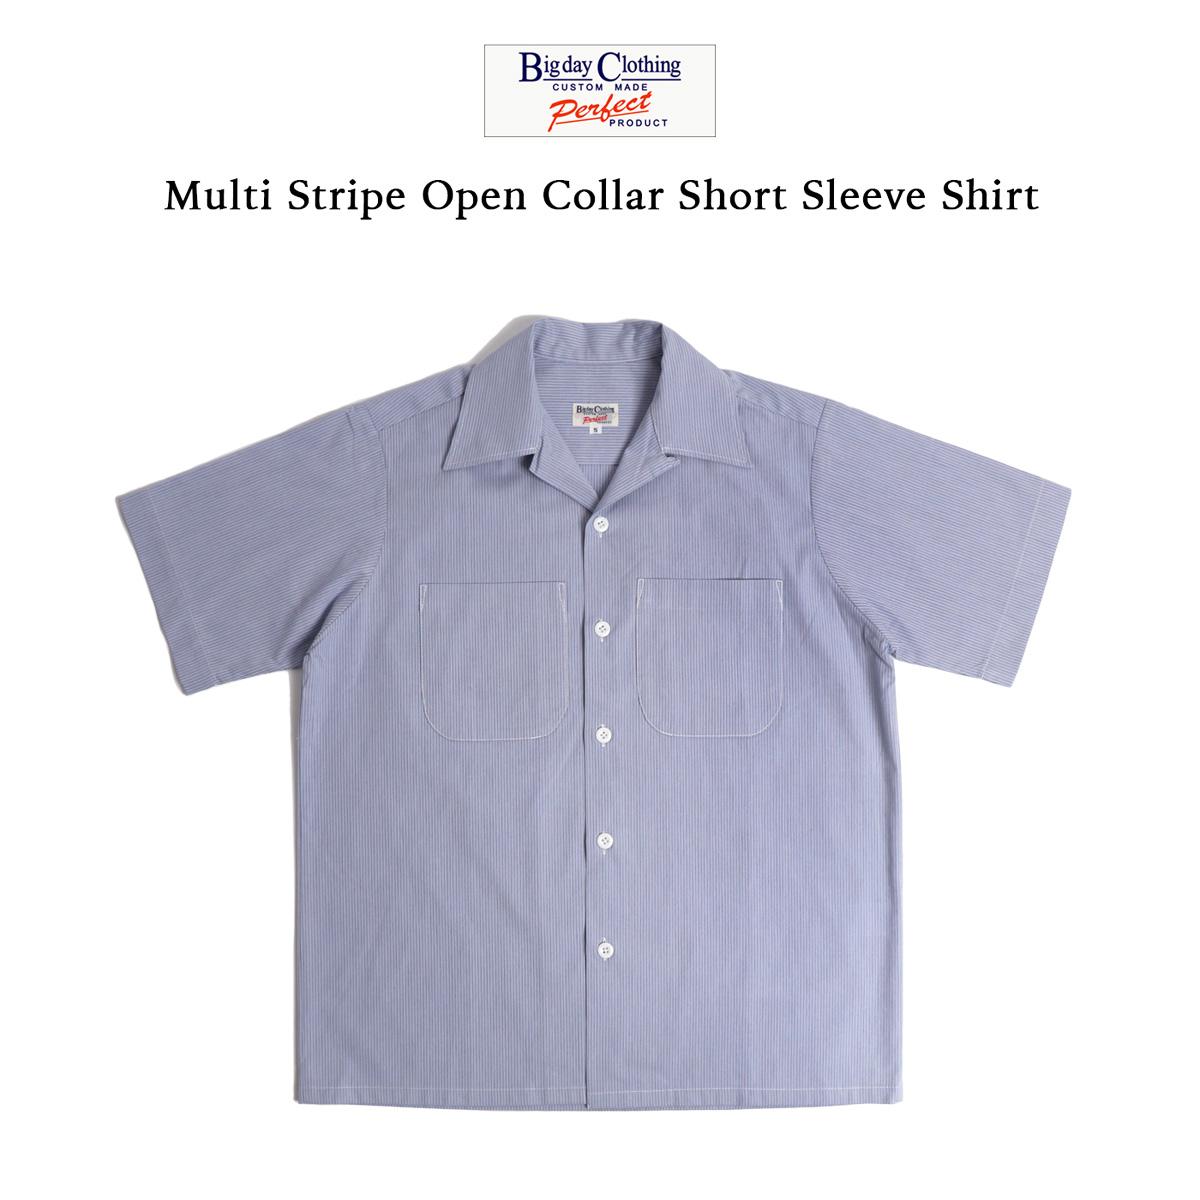 BIG DAY ビッグデイ シャツ 半袖 メンズ ストライプ オープンカラー半袖シャツ マルチストライプ 60sスタイル ブルー 綿100% 日本製